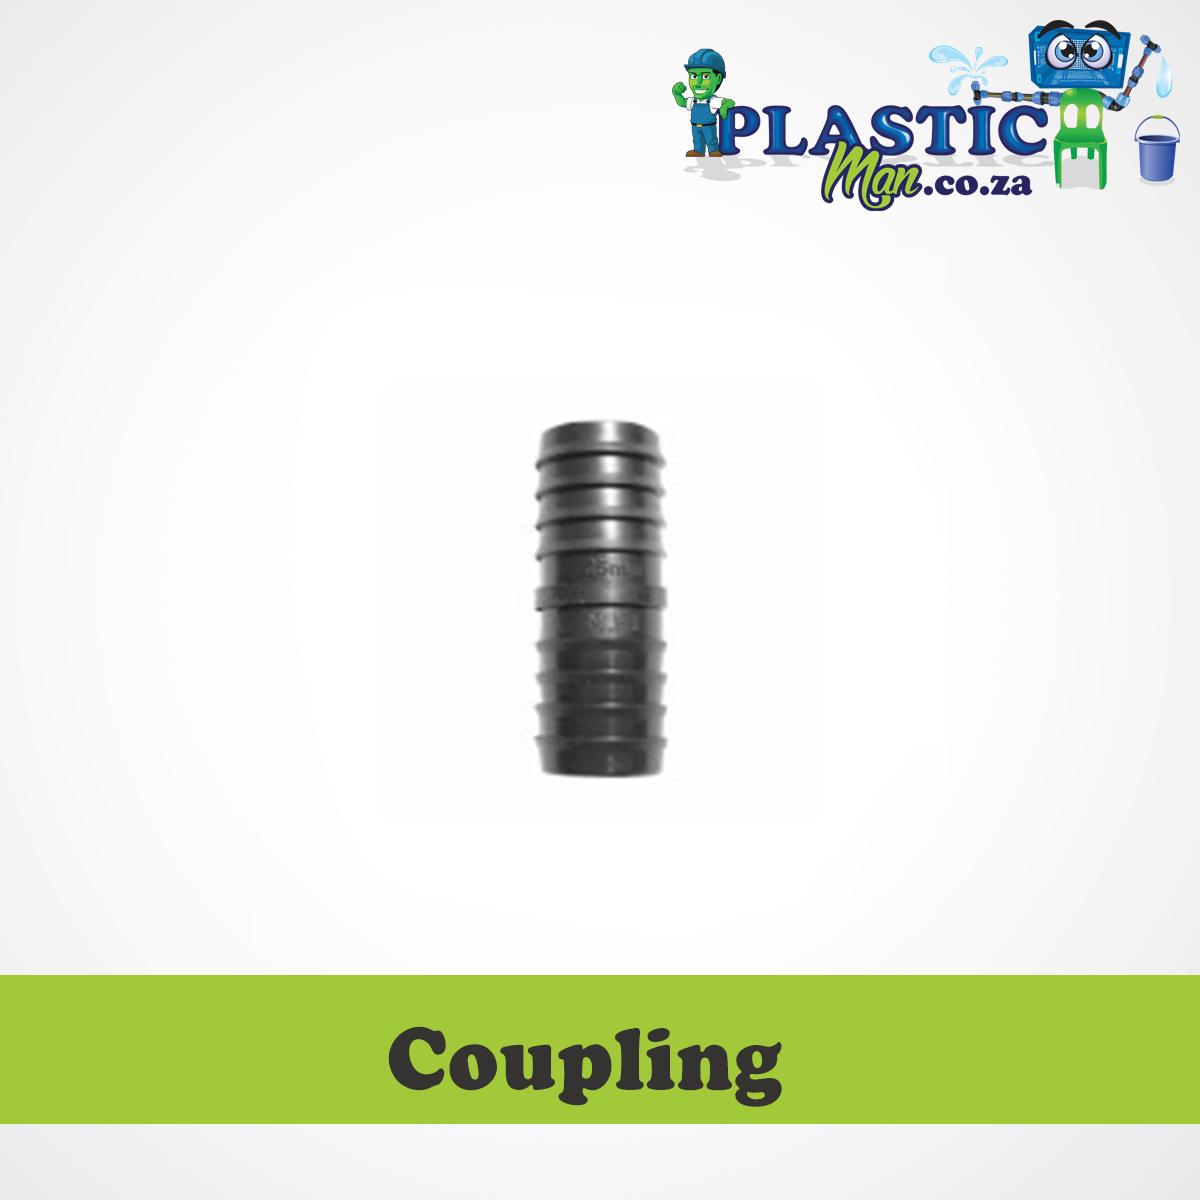 Plasticman LDPE - Coupling